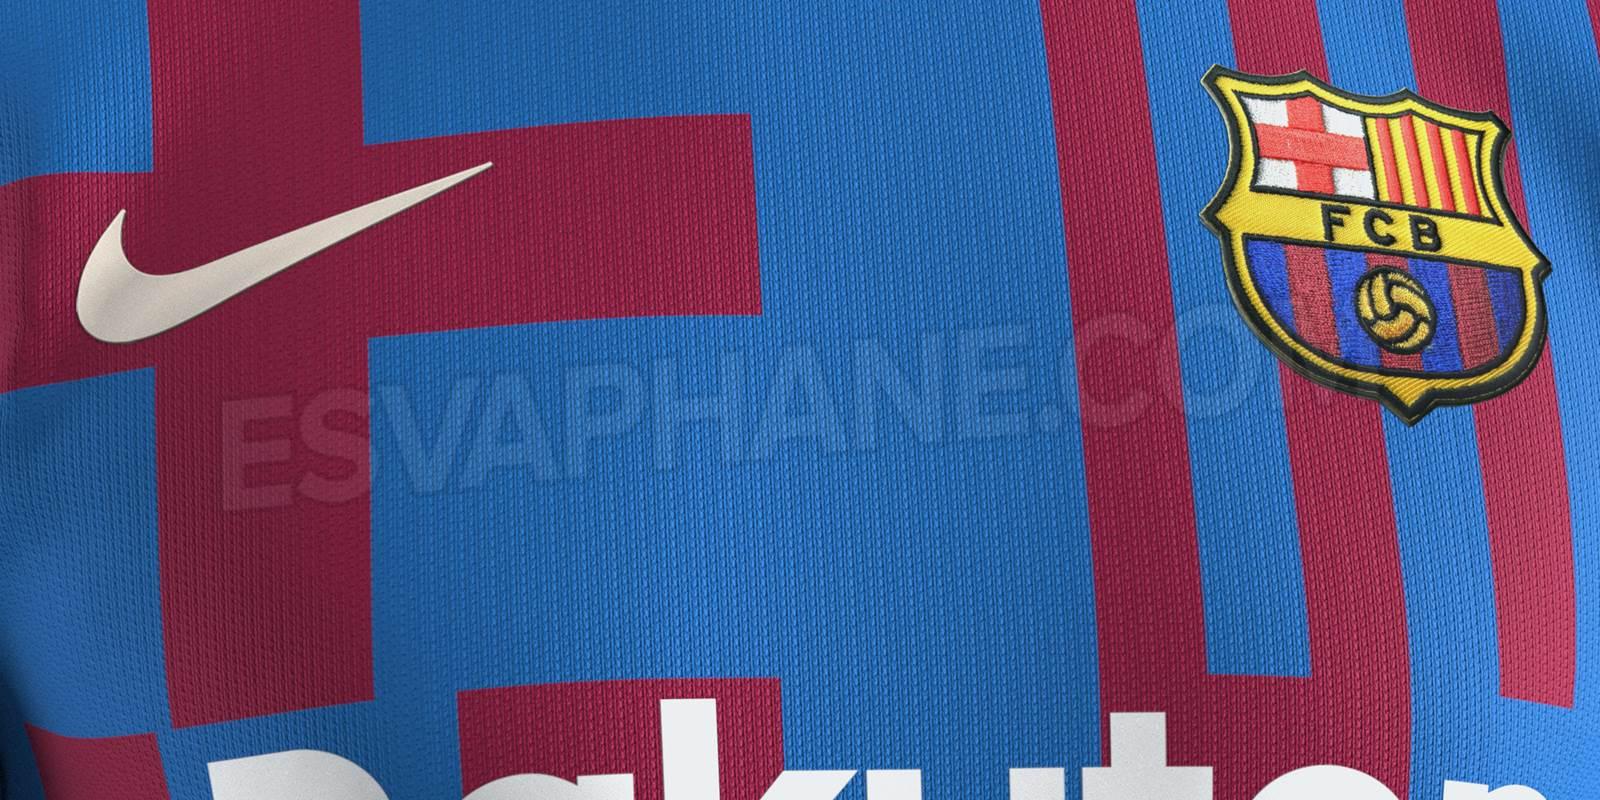 official colors leaked fc barcelona 21 22 home kit design leaked footy headlines fc barcelona 21 22 home kit design